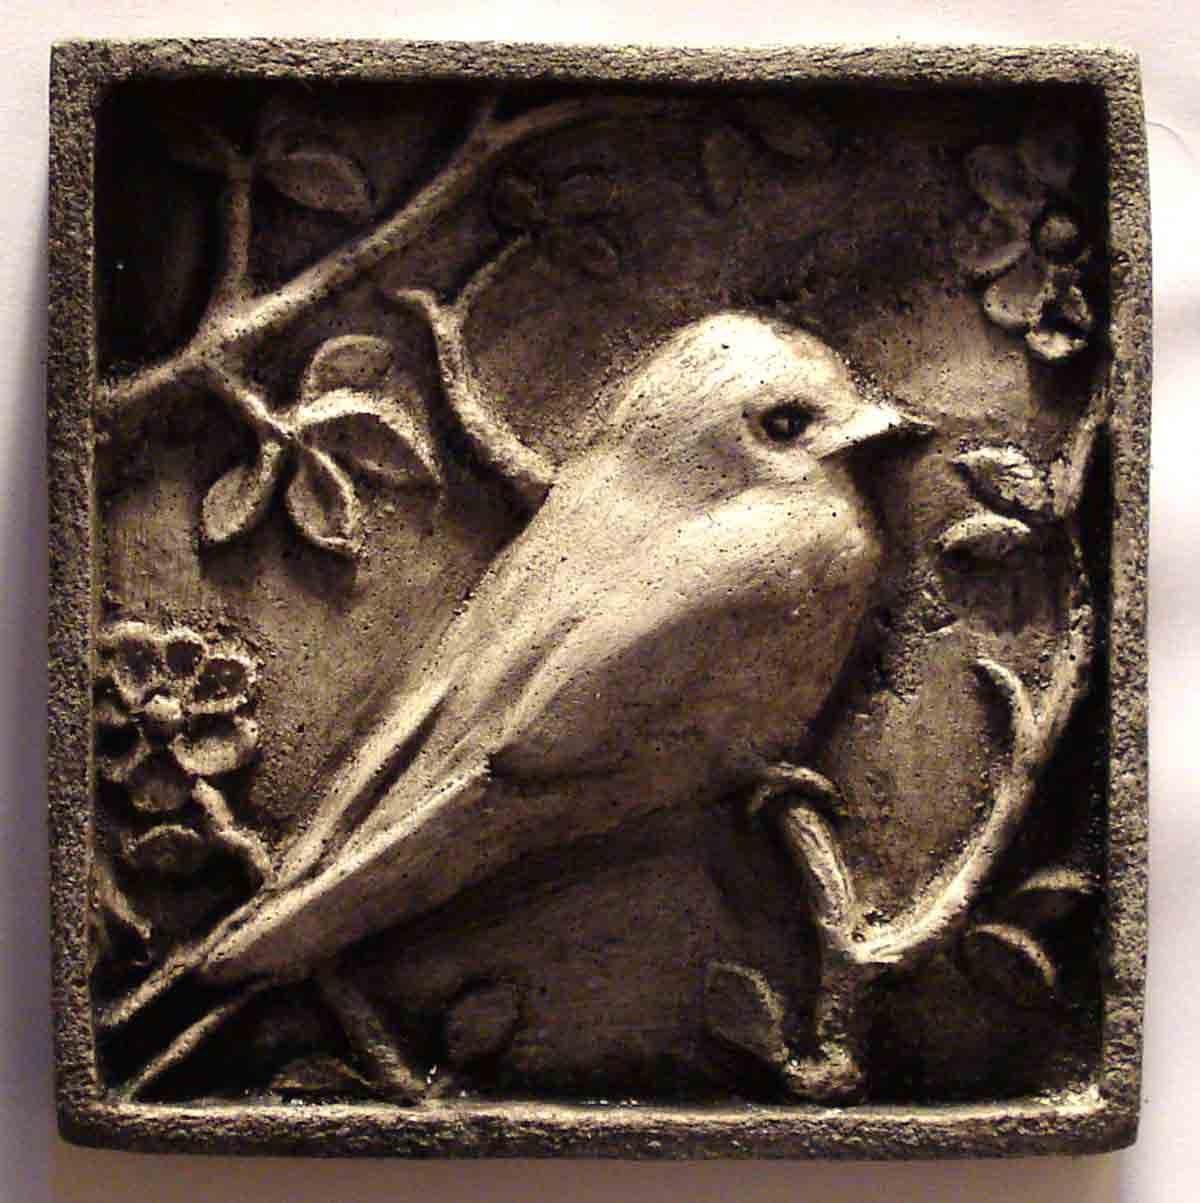 Handmade carved relief decorative bird stone wall plaque